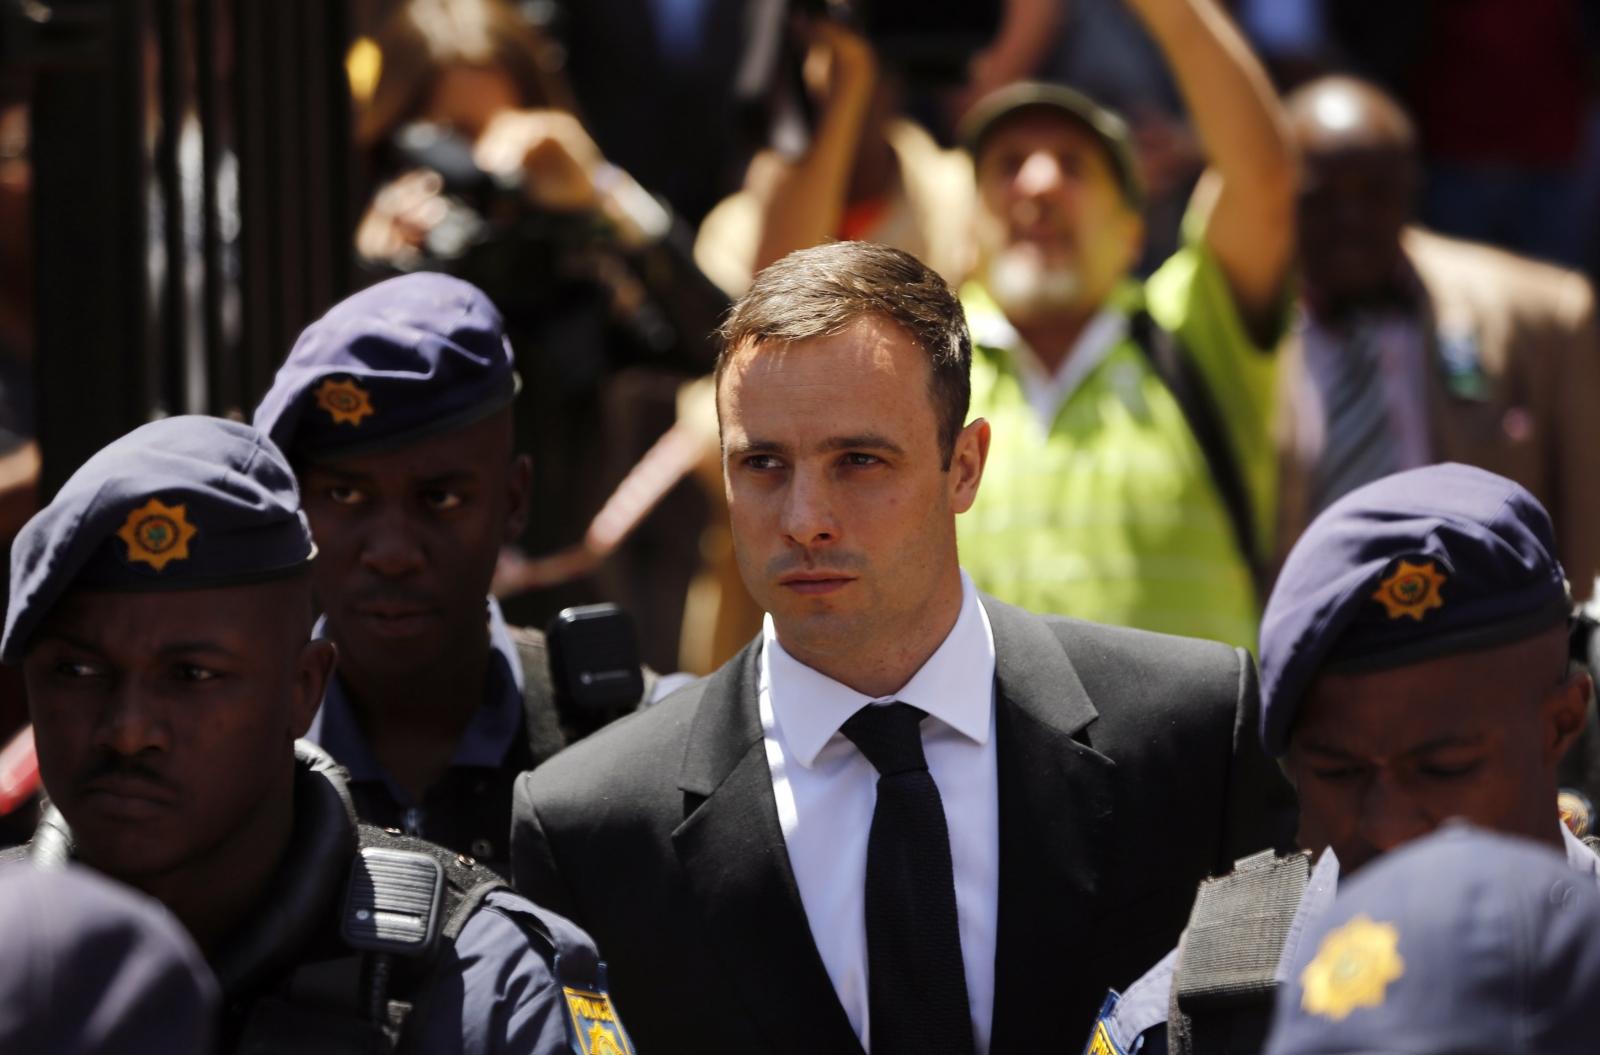 Pistorius Sentenced to Five Years Jail for Killing Girlfriend Reeva Steenkamp